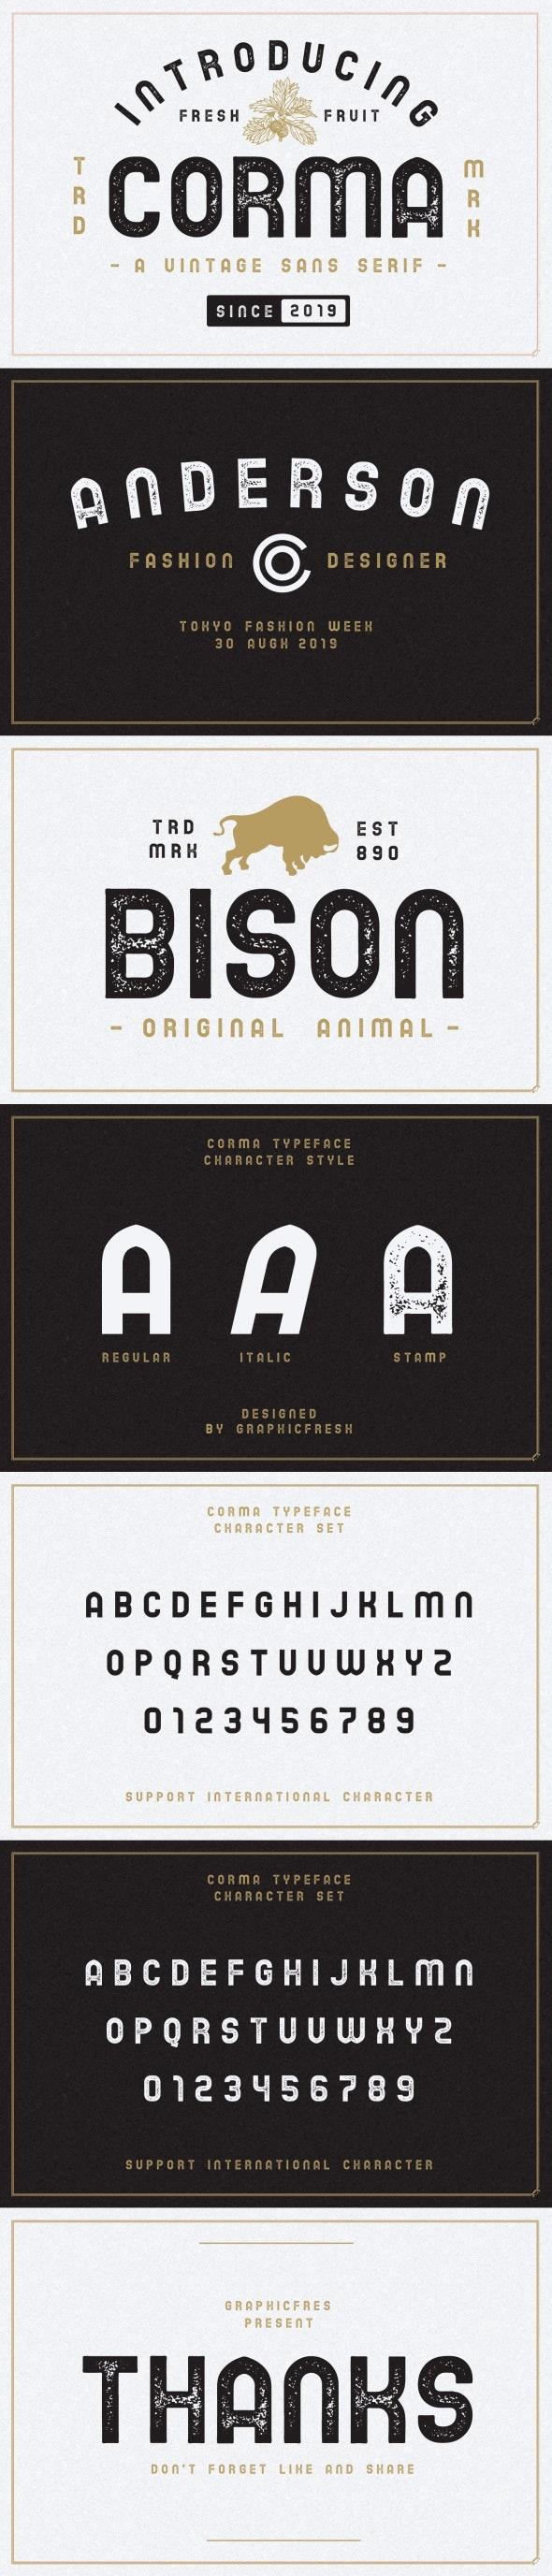 The Corma – 4 Font Files - Sans-Serif Fonts